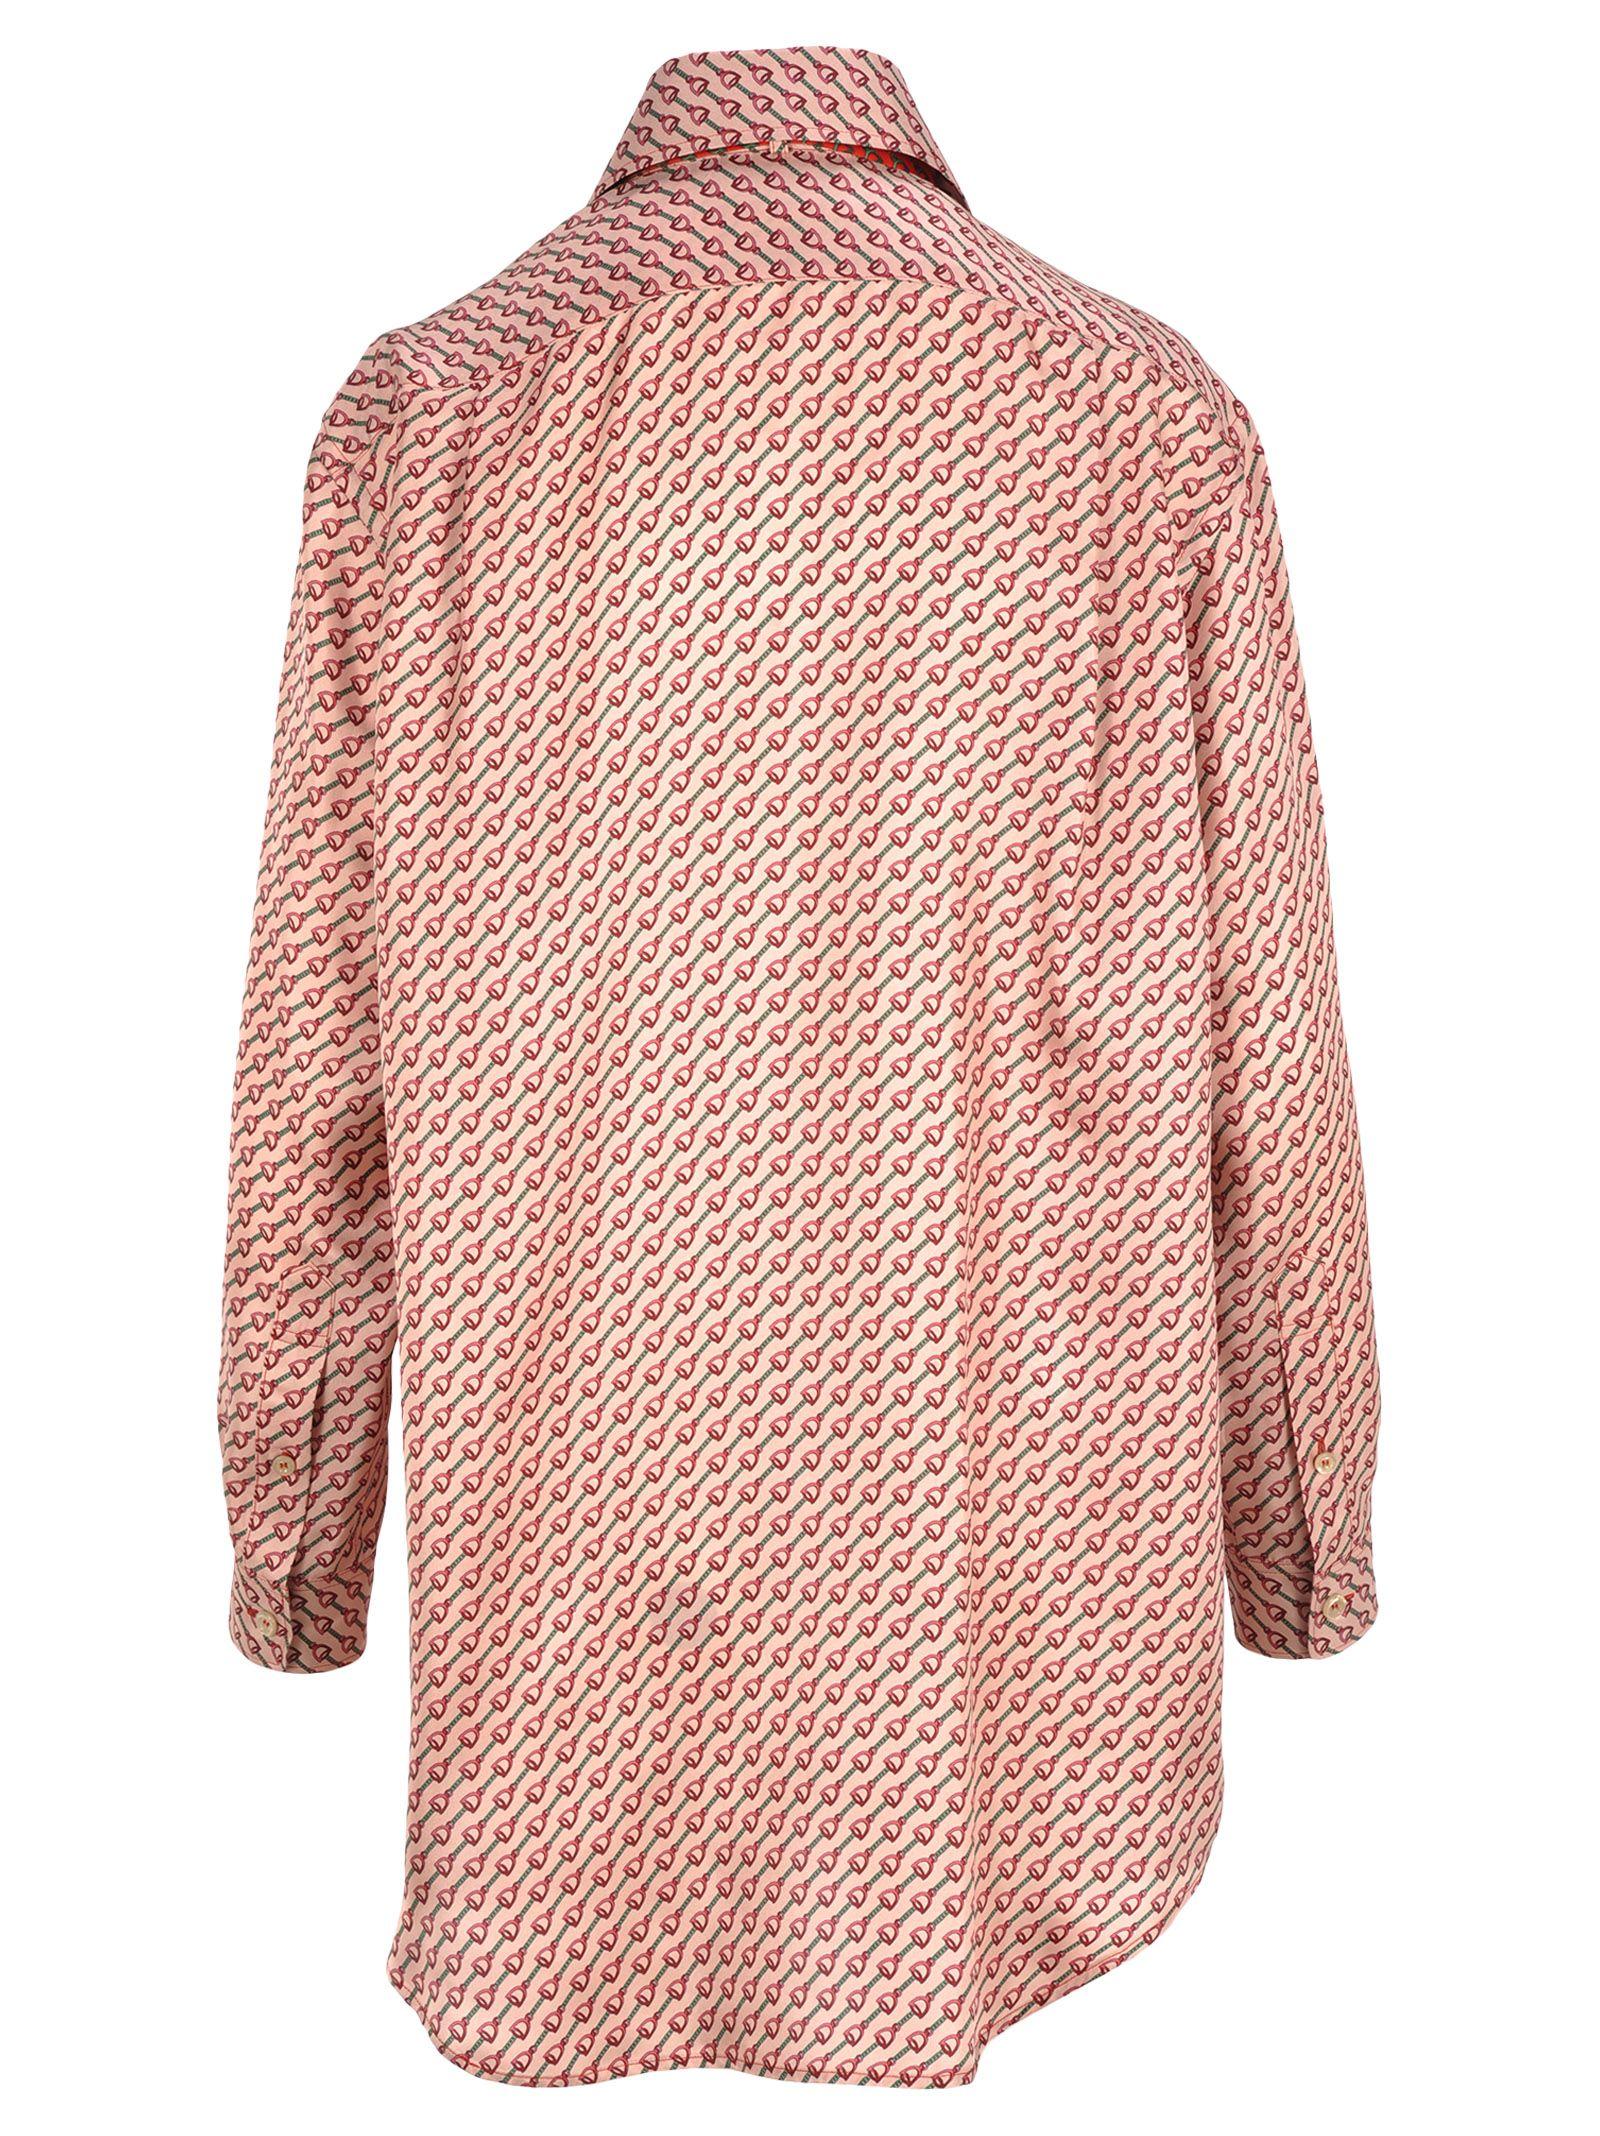 9b895ba7a Gucci Gucci Gucci Silk Shirt With Stirrups Print - PINK FUXIA MULTI ...